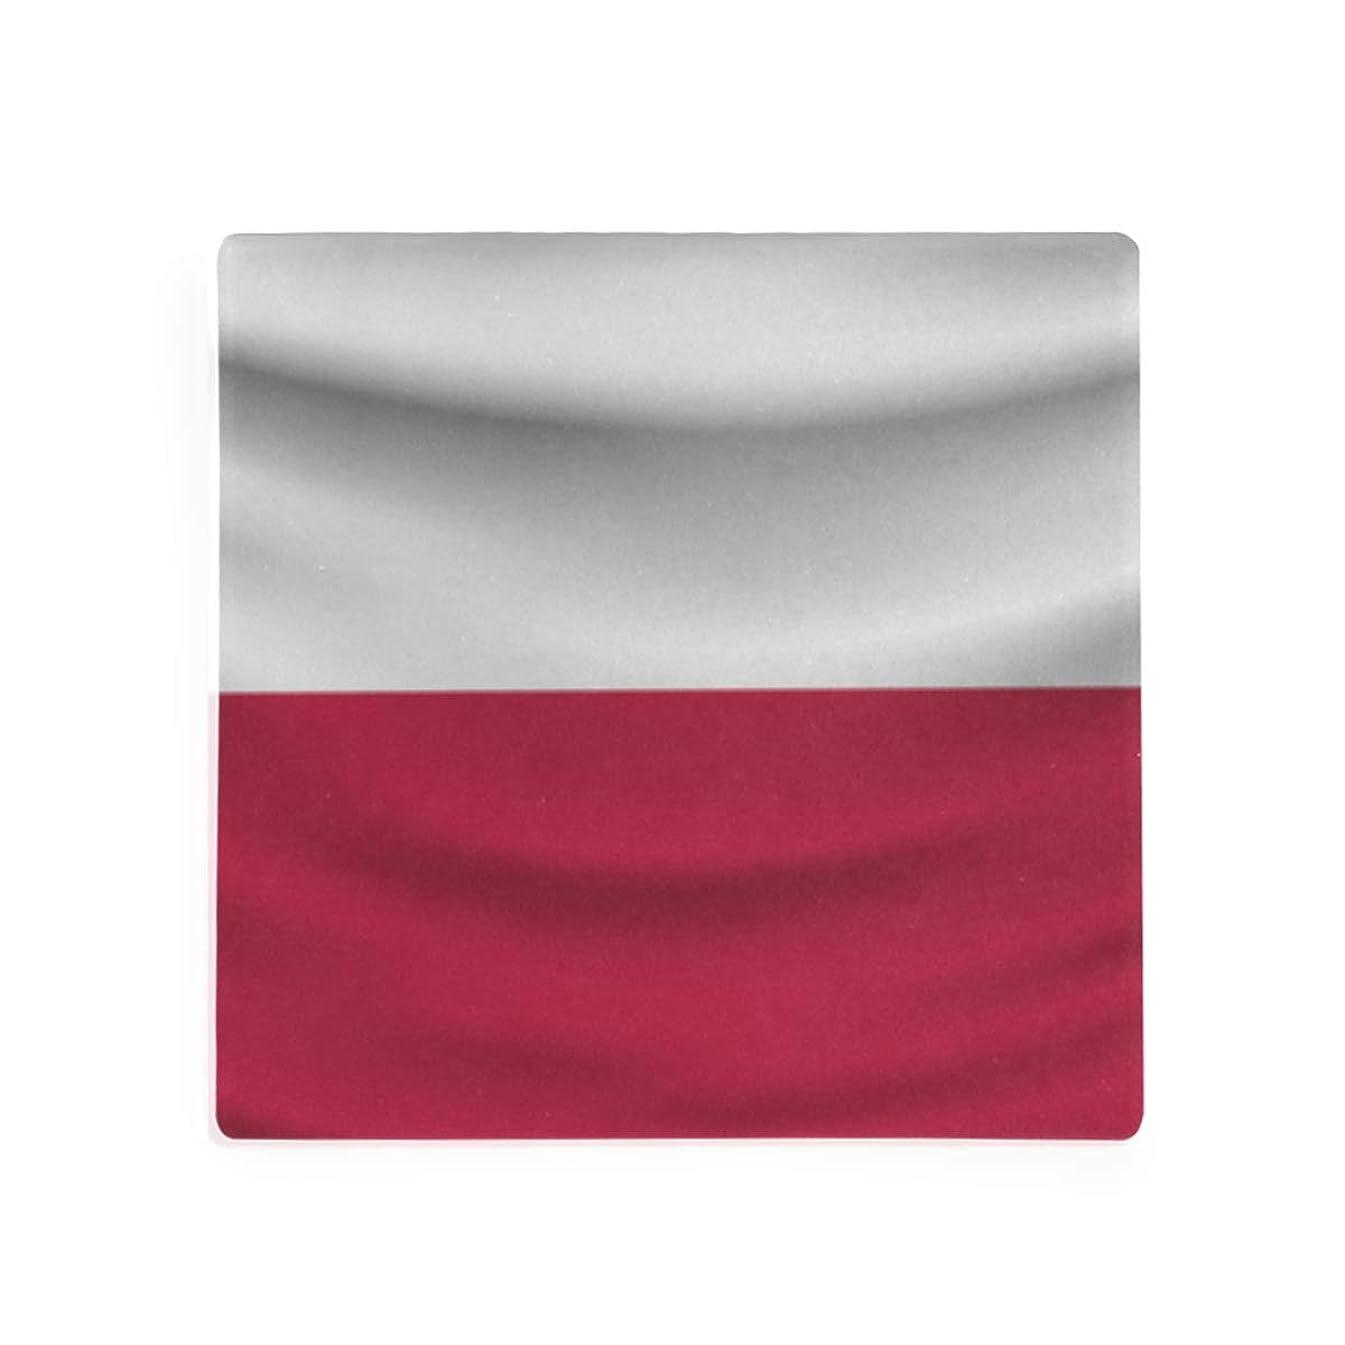 Poland Flag Square Coaster for Drinks Set of 1